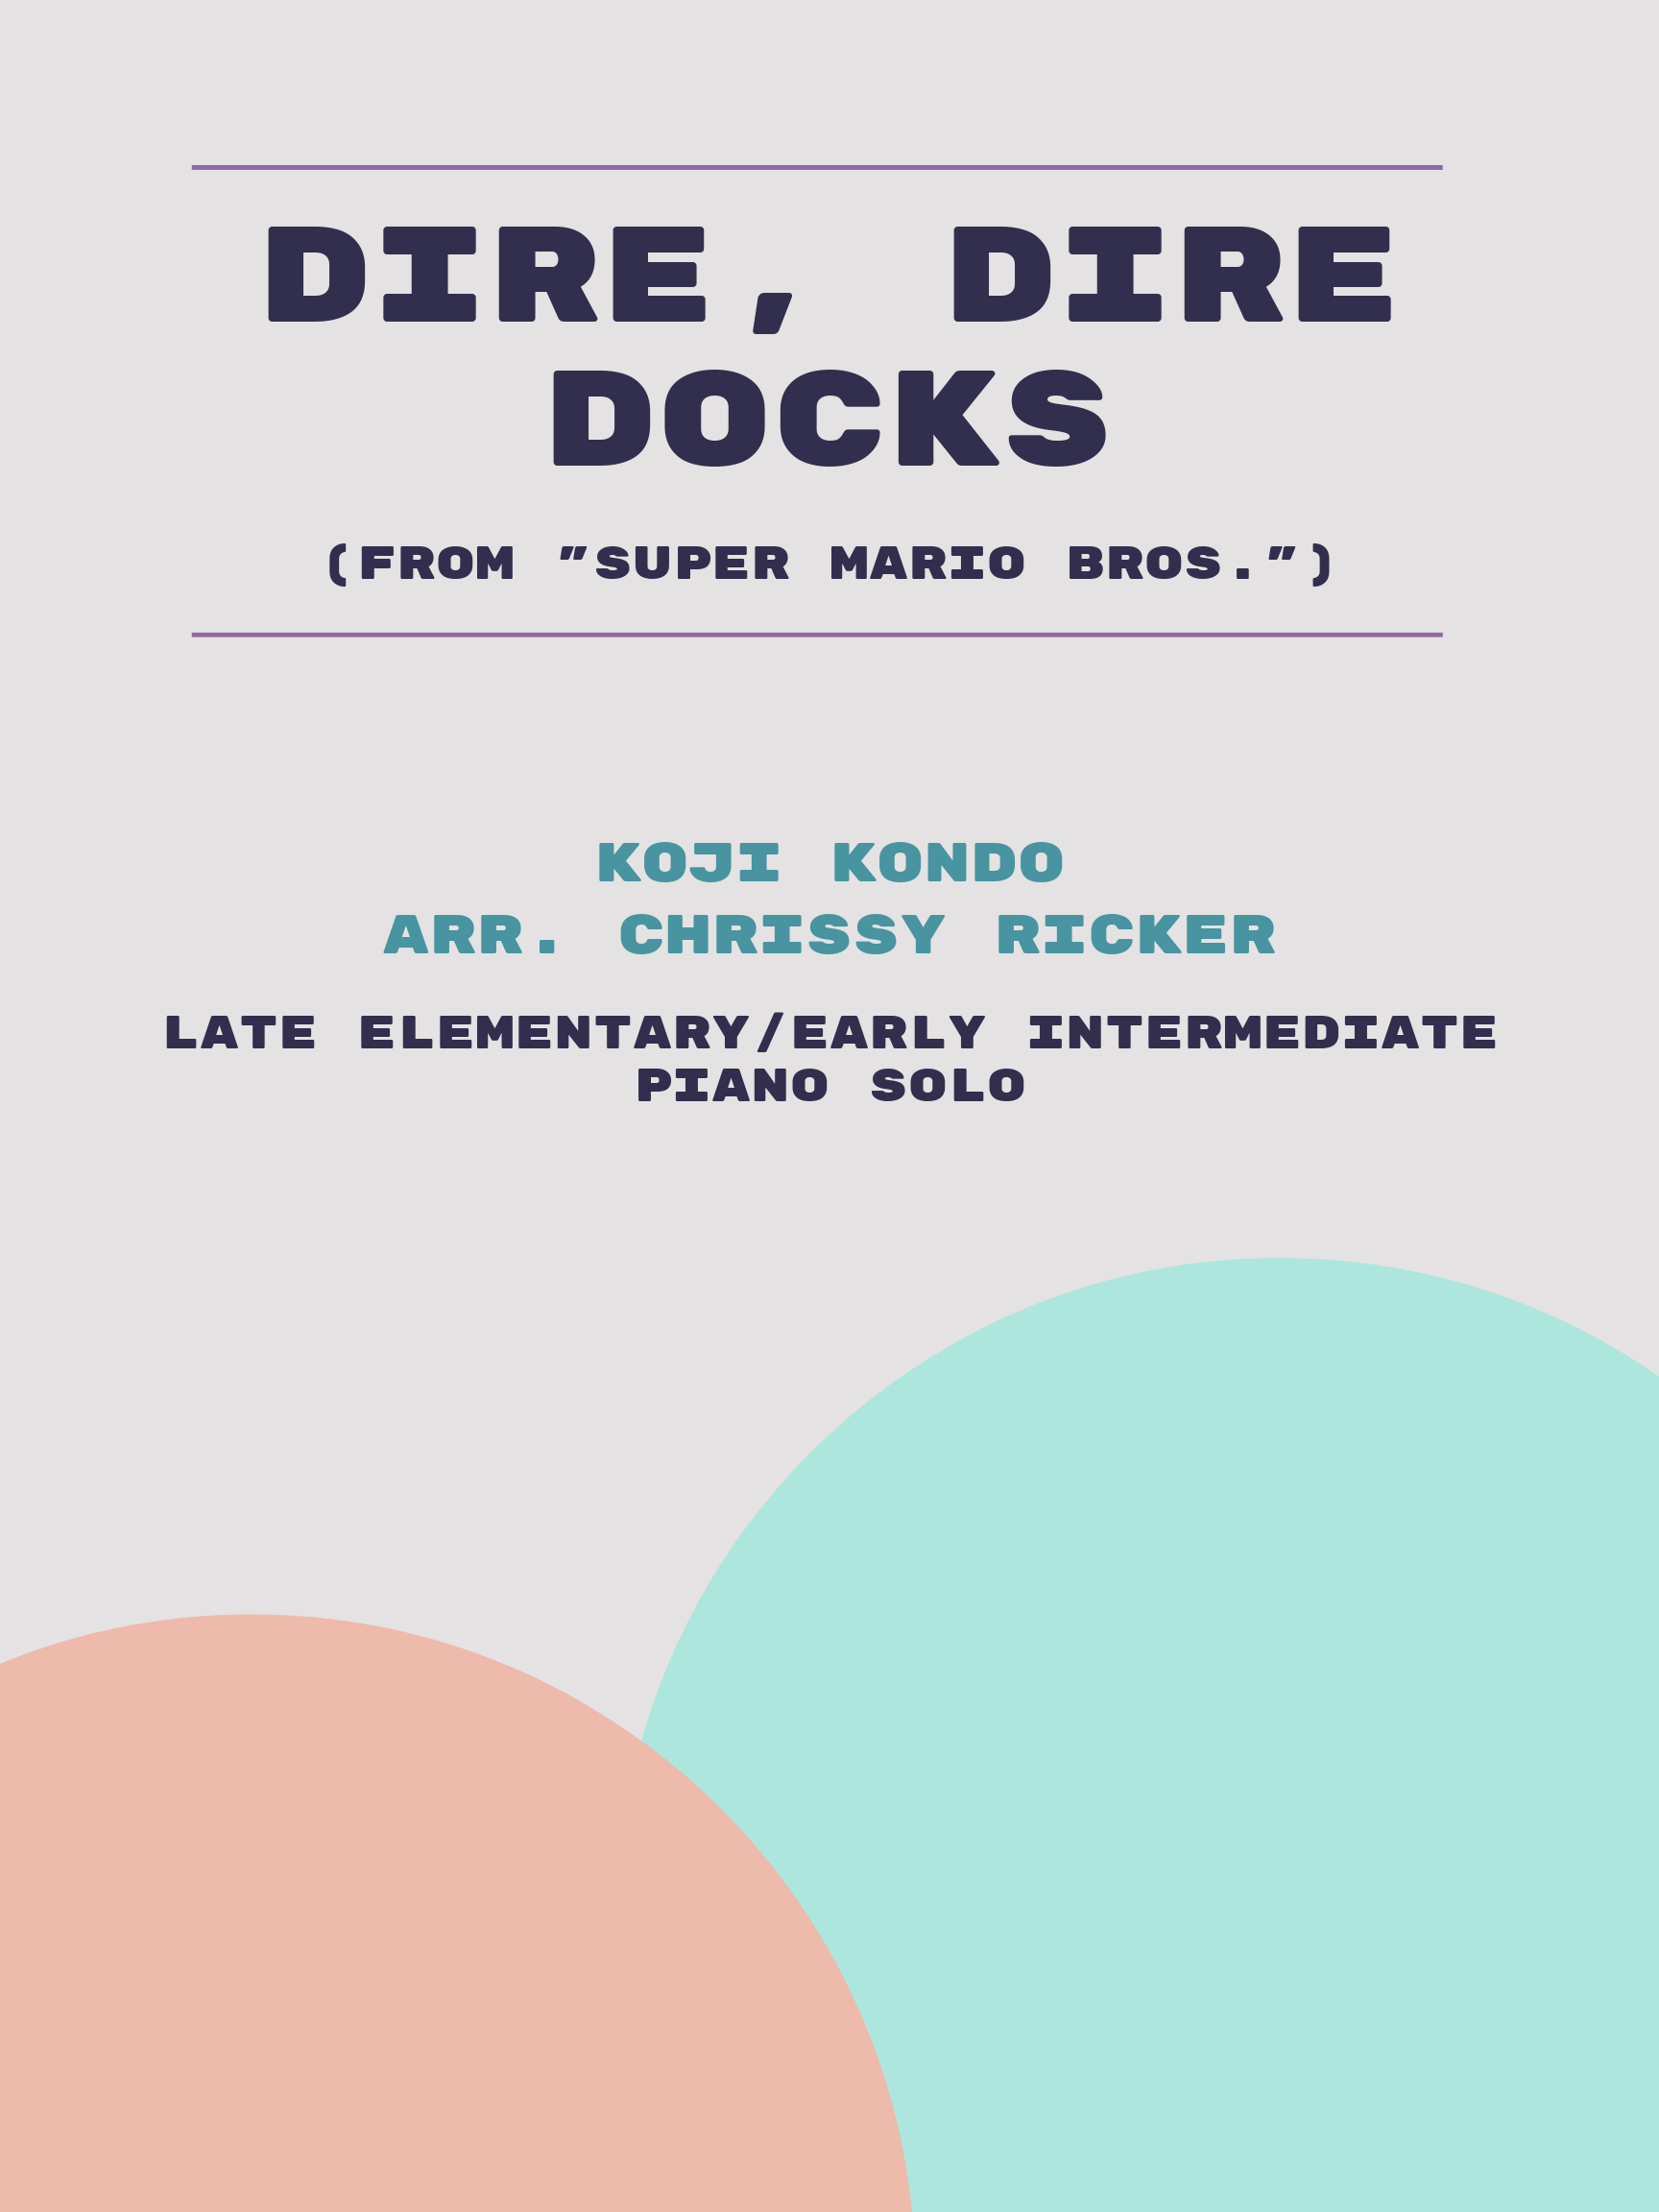 Dire, Dire Docks Sample Page